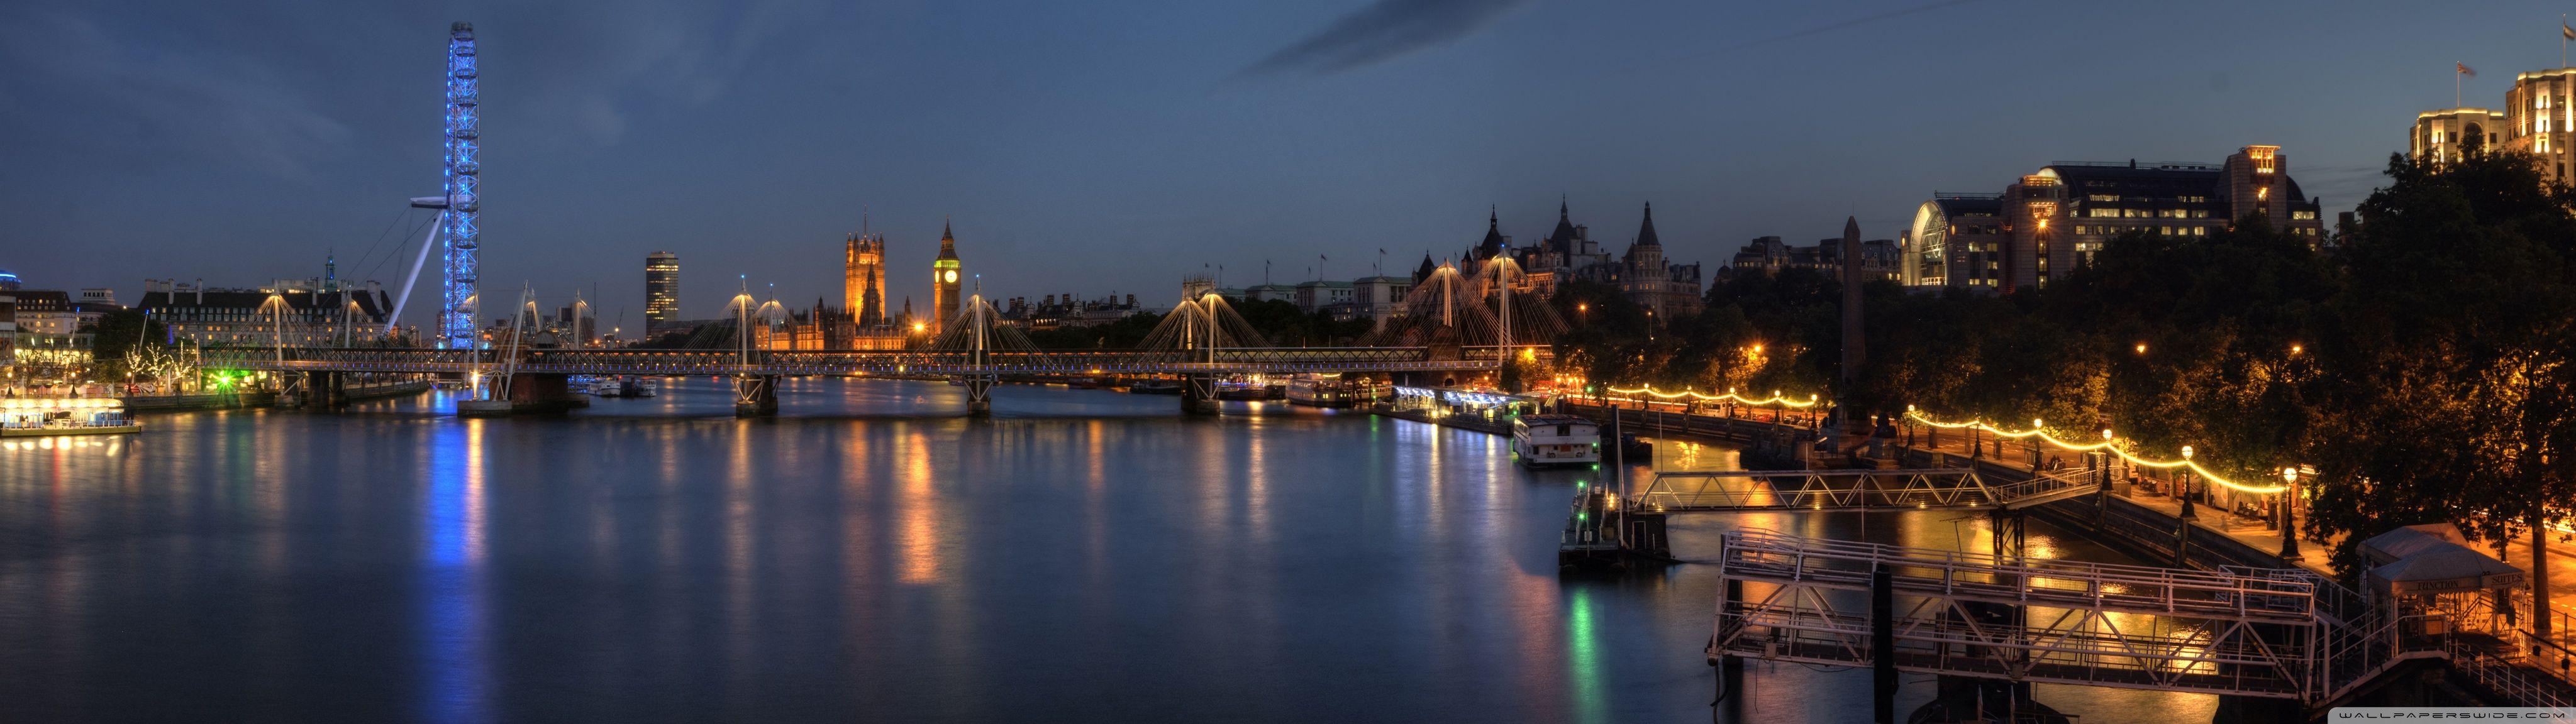 London At Night Panorama HD desktop wallpaper Widescreen High